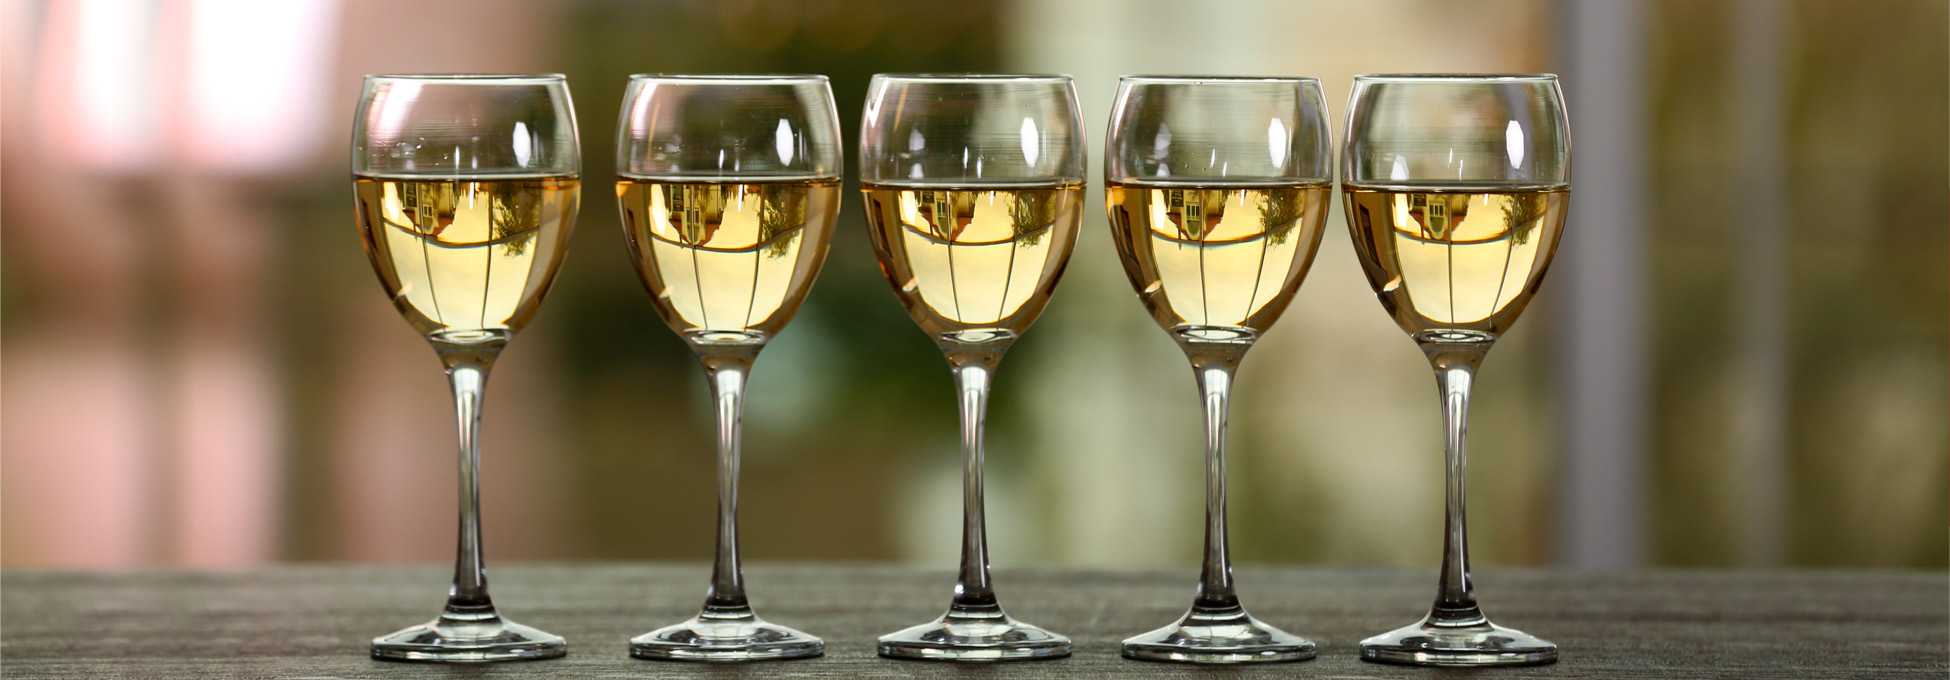 trigs-homepg-white-wine-sale.jpg